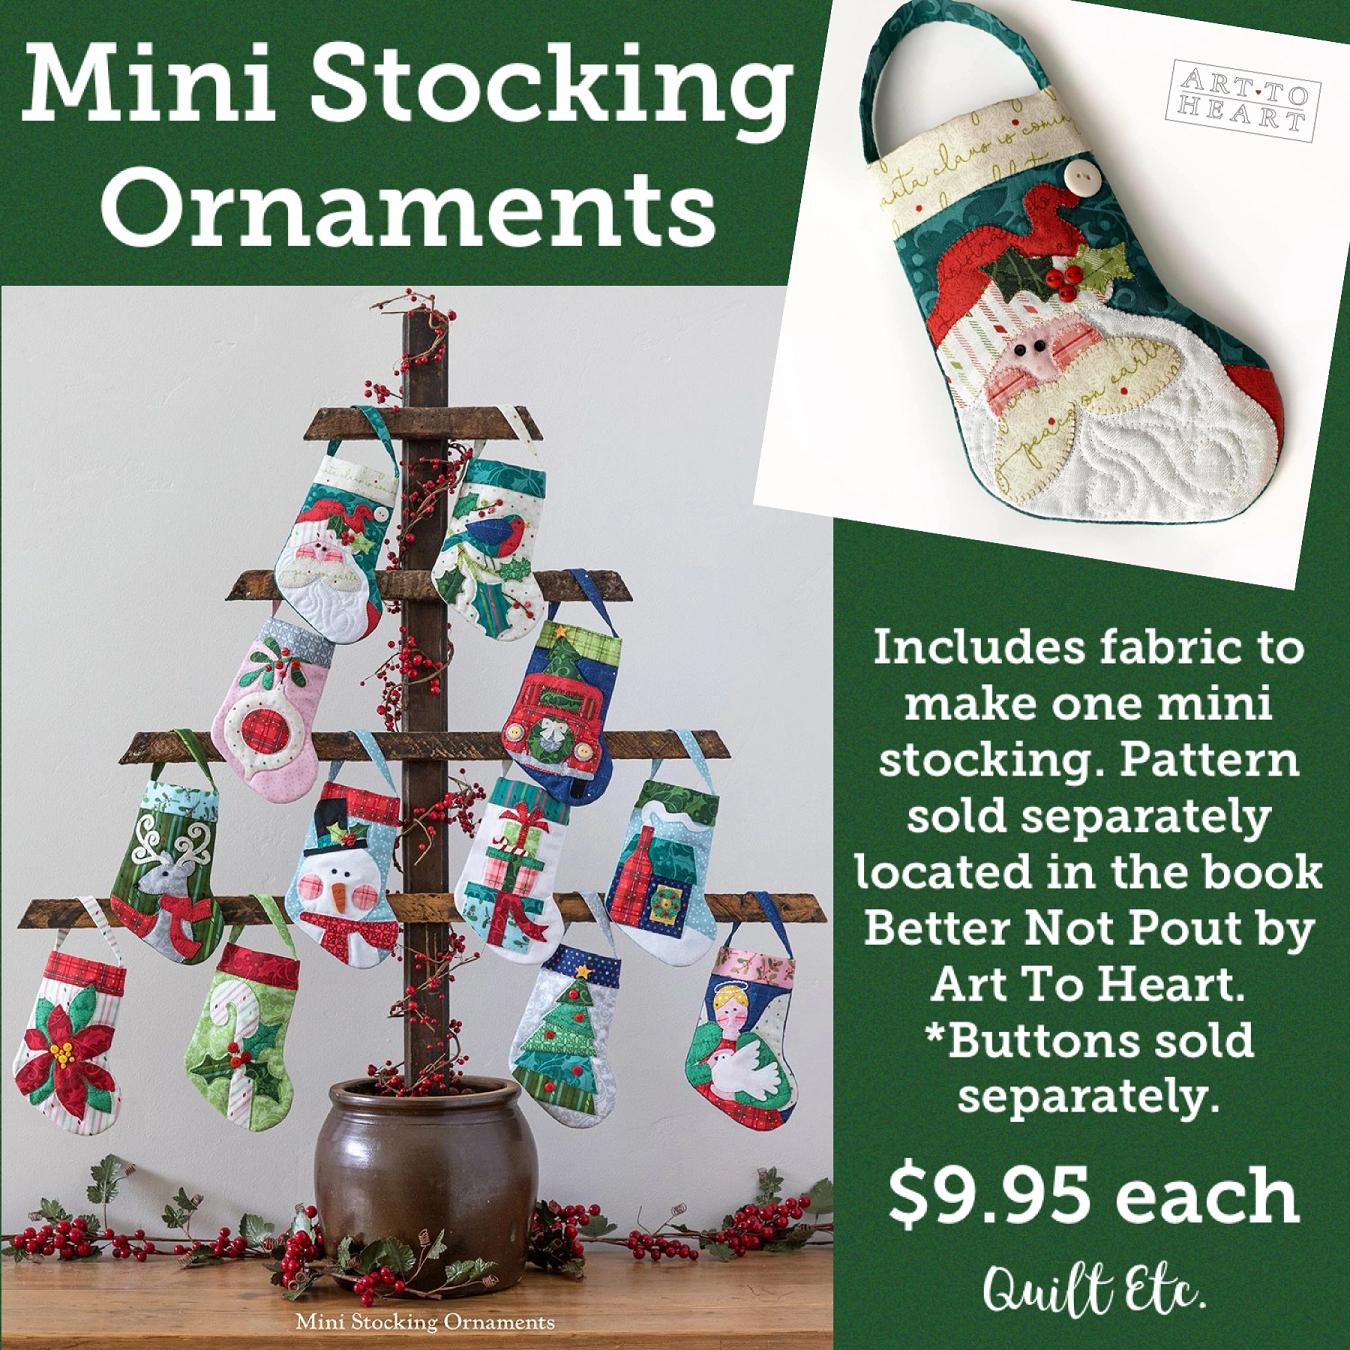 Better Not Pout Mini Stocking Ornaments